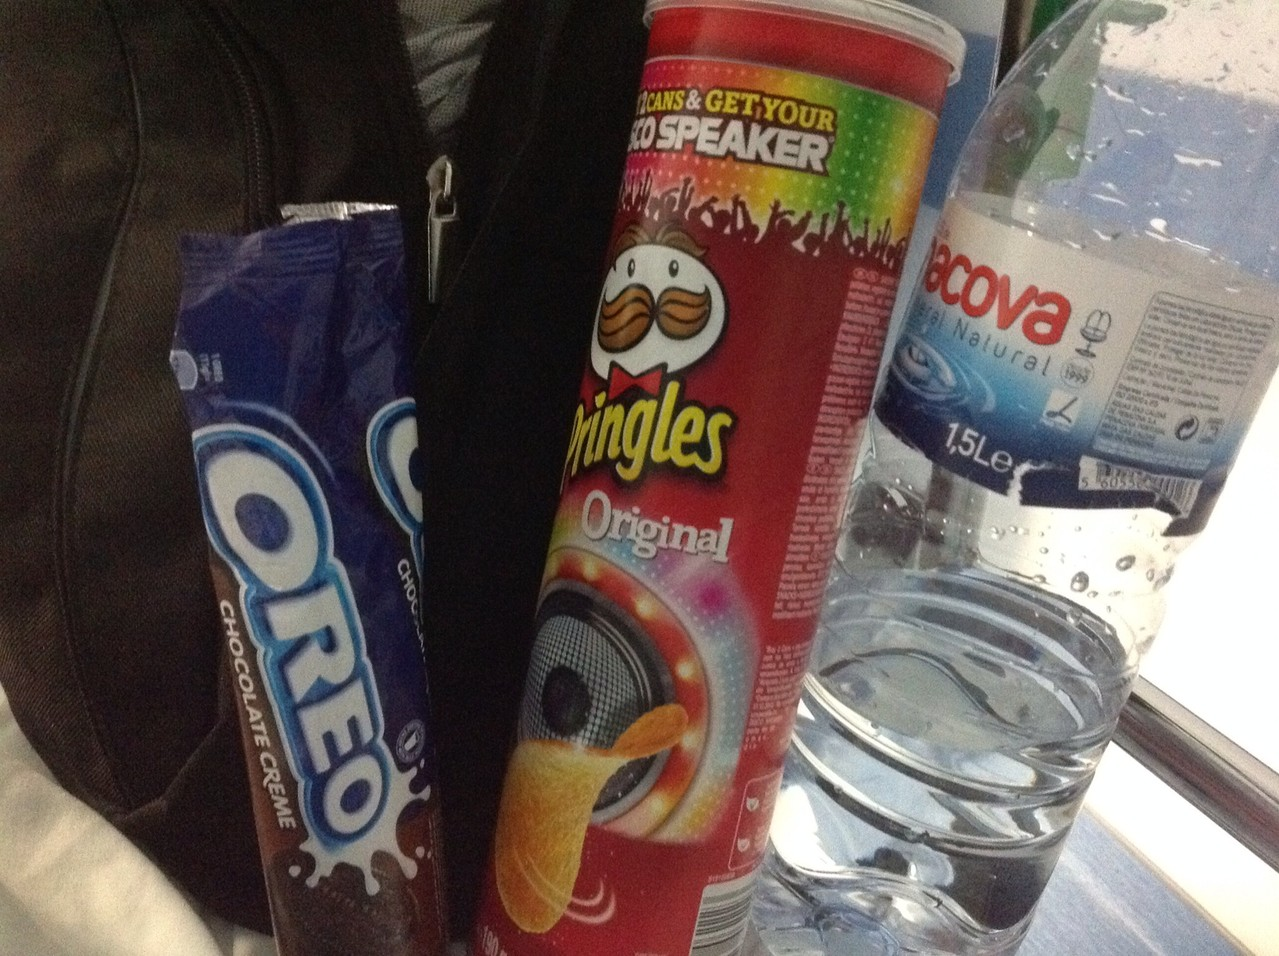 Pringles Original, Oreokekse (die dunklen), Wasser